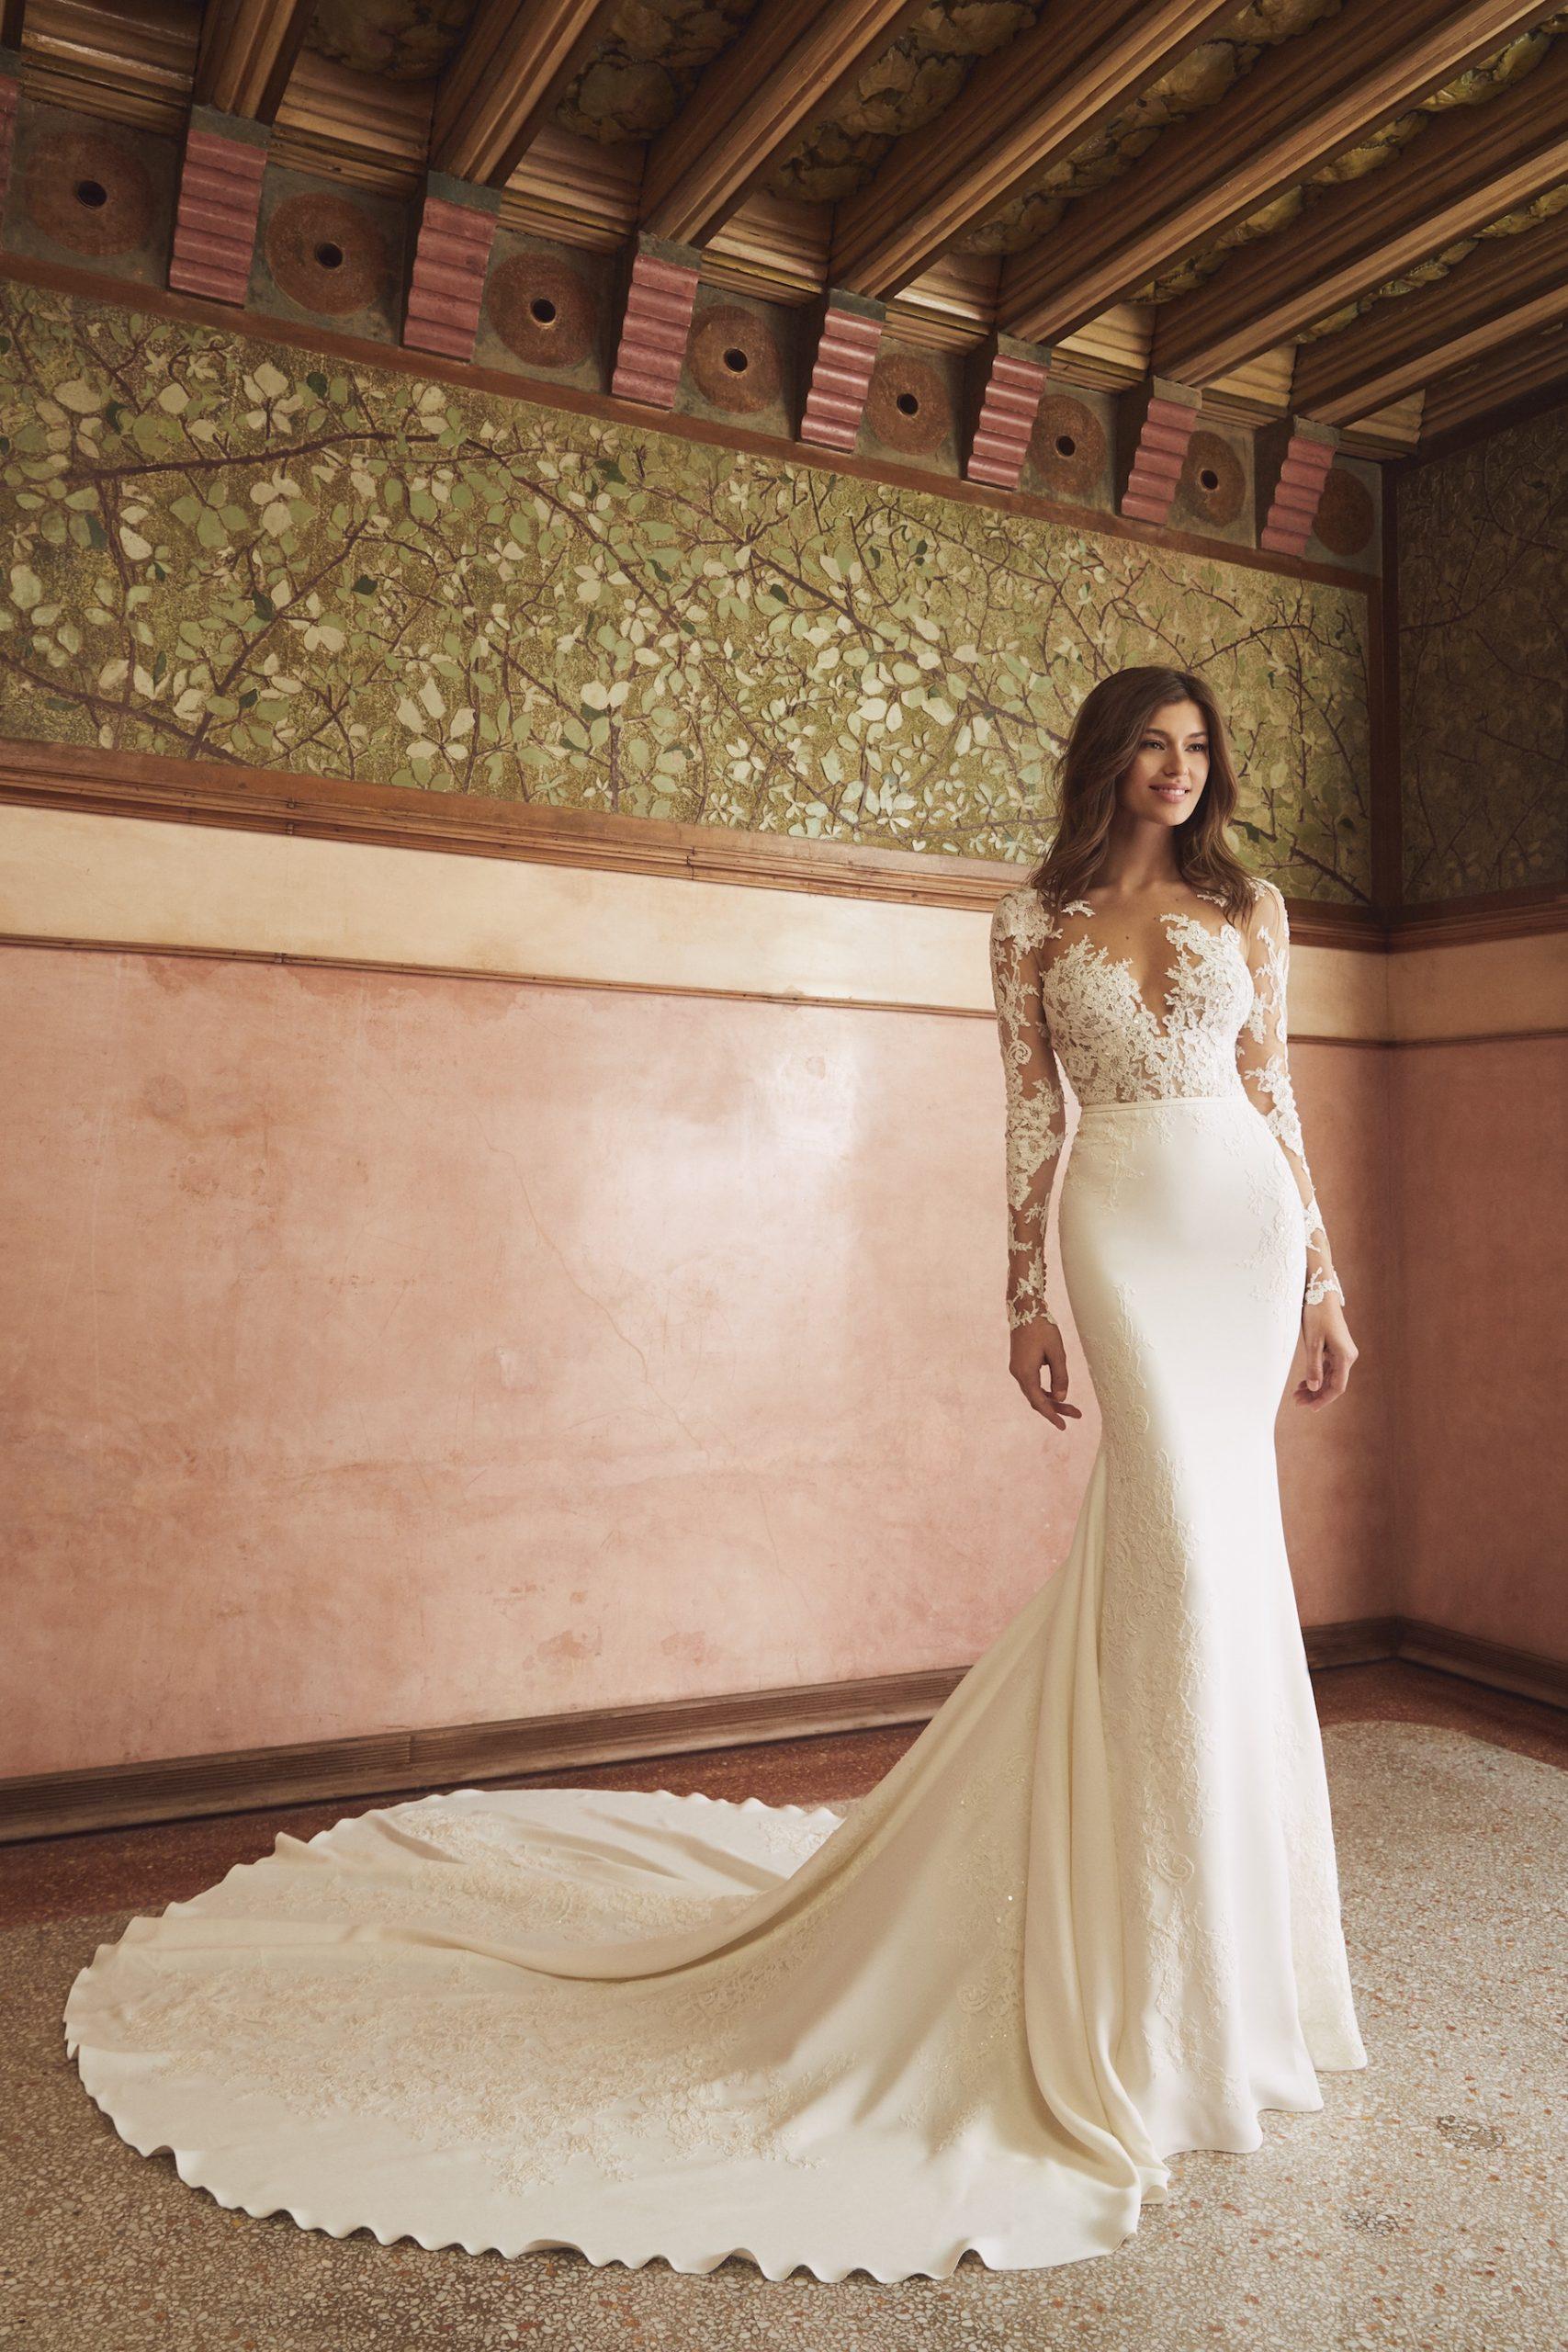 Long Sleeve Illusion Neckline Lace Bodice Sheath Wedding Dress With Crepe Skirt by Pronovias x Kleinfeld - Image 1